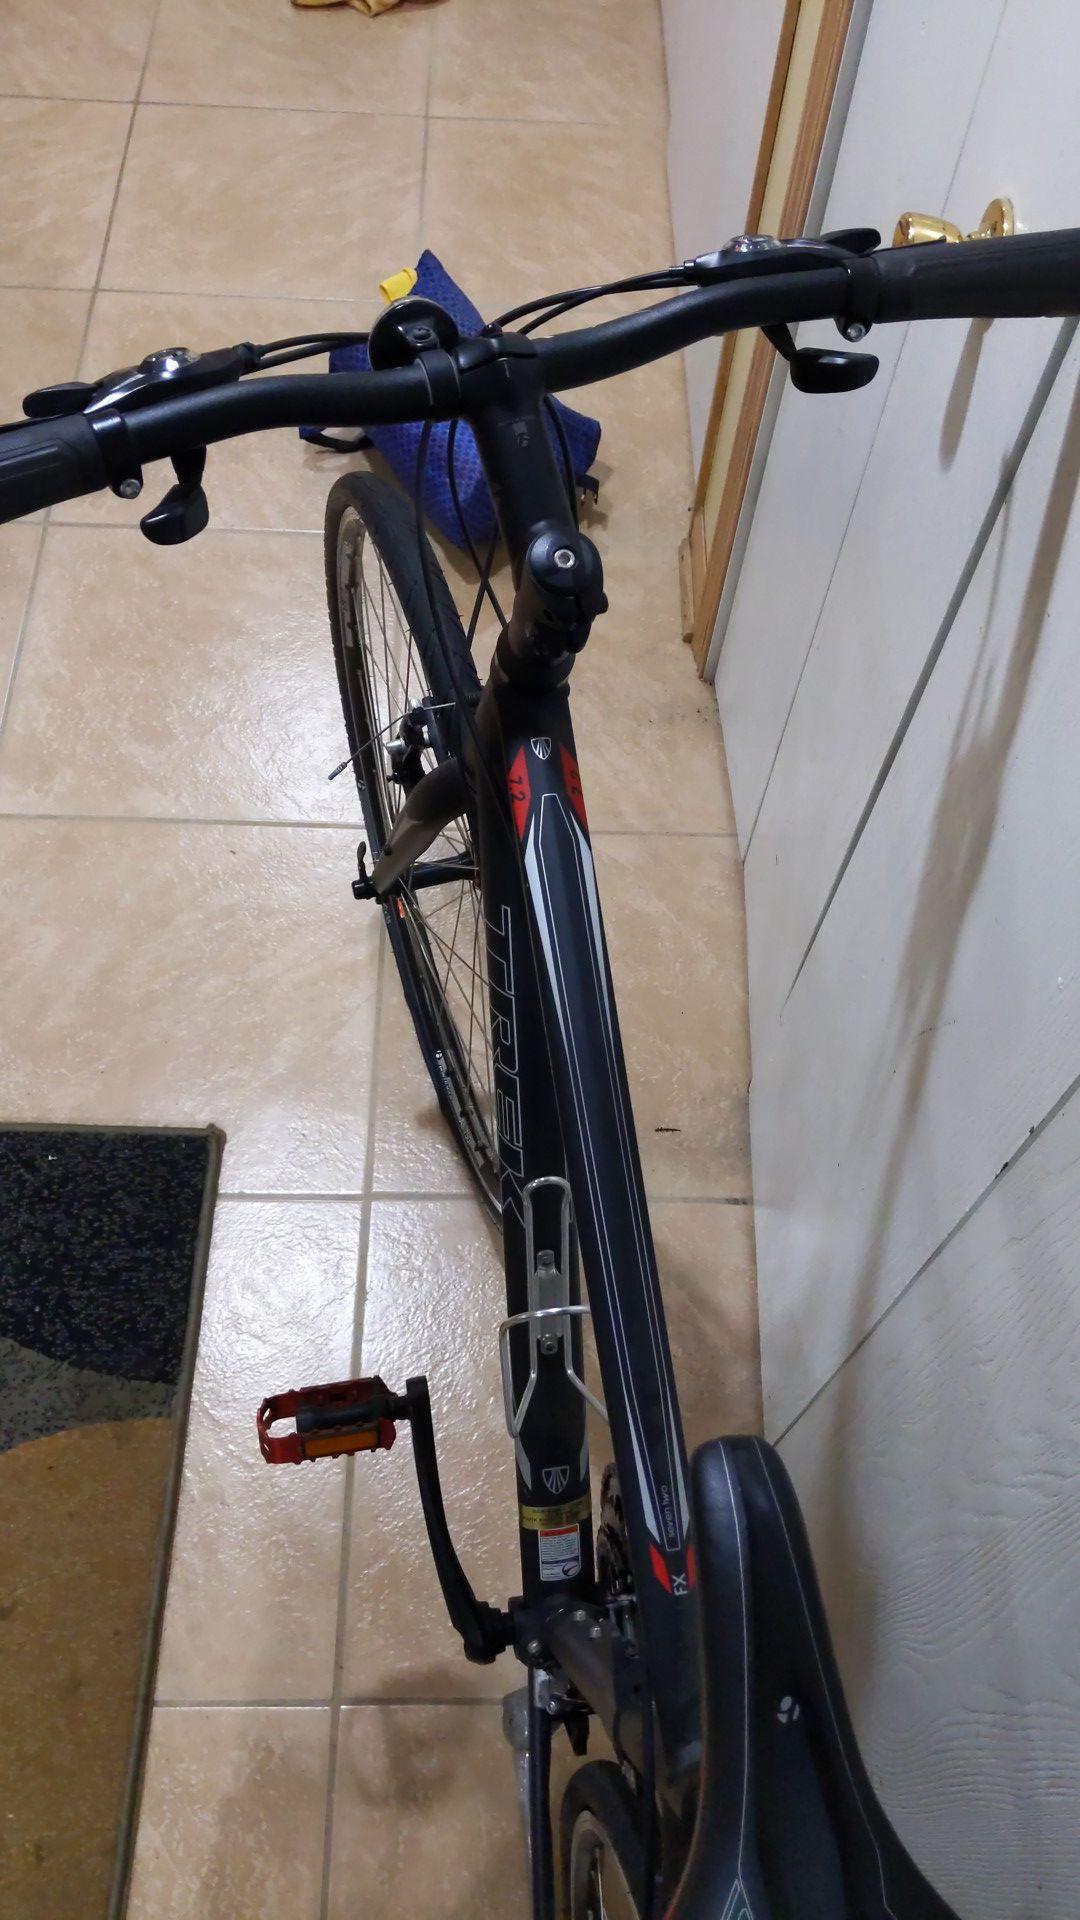 Bicycle TREK Fx series - seven two